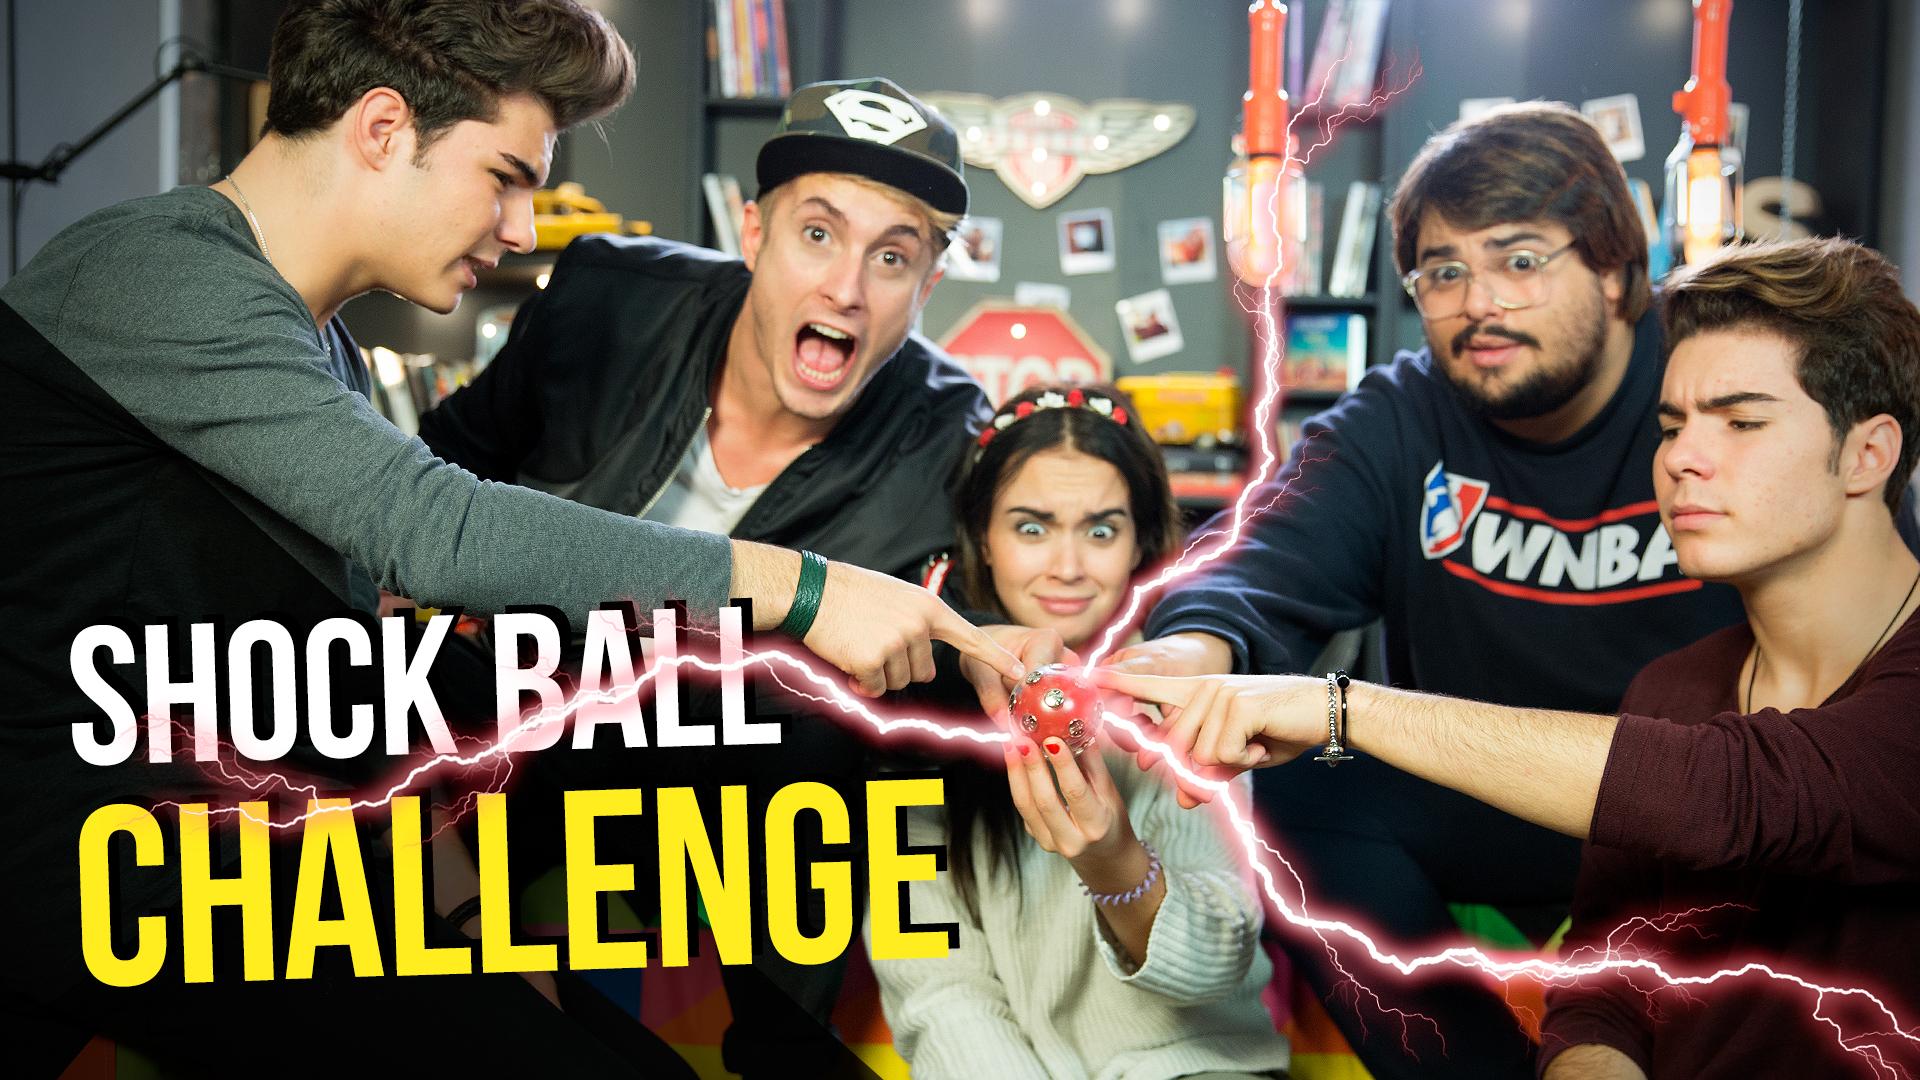 Temporada 1 Shock Ball challenge con Gemeliers